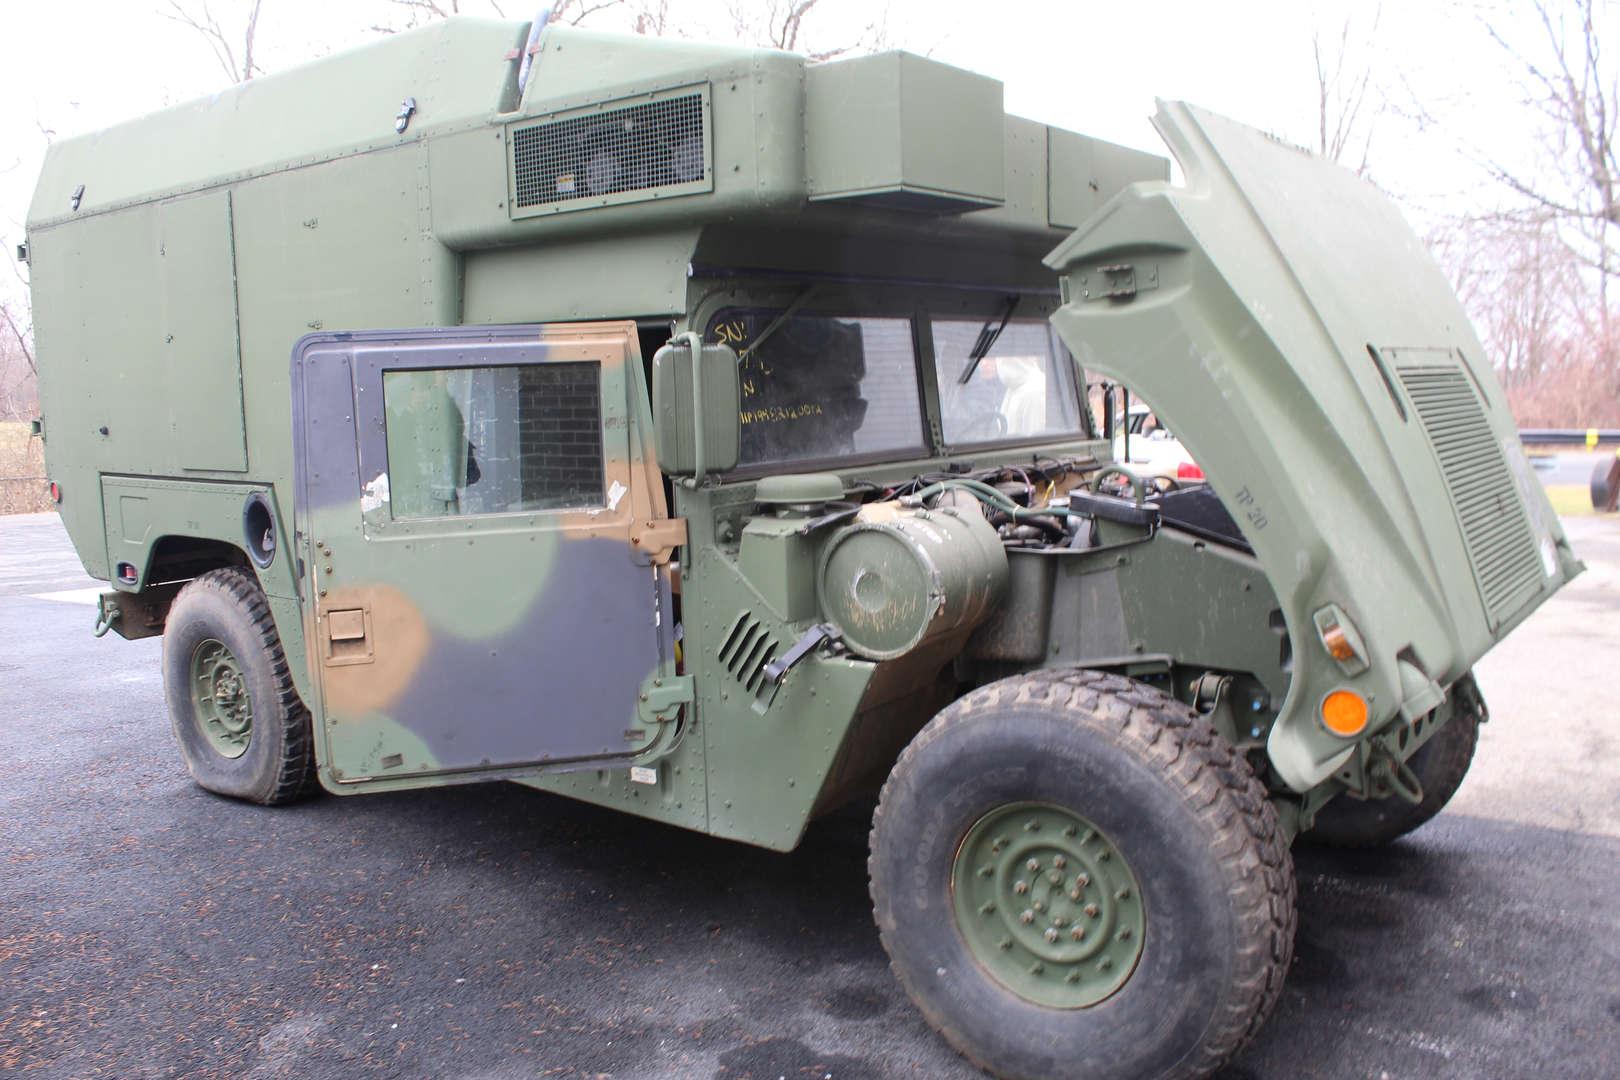 Military Humvee with its hood up